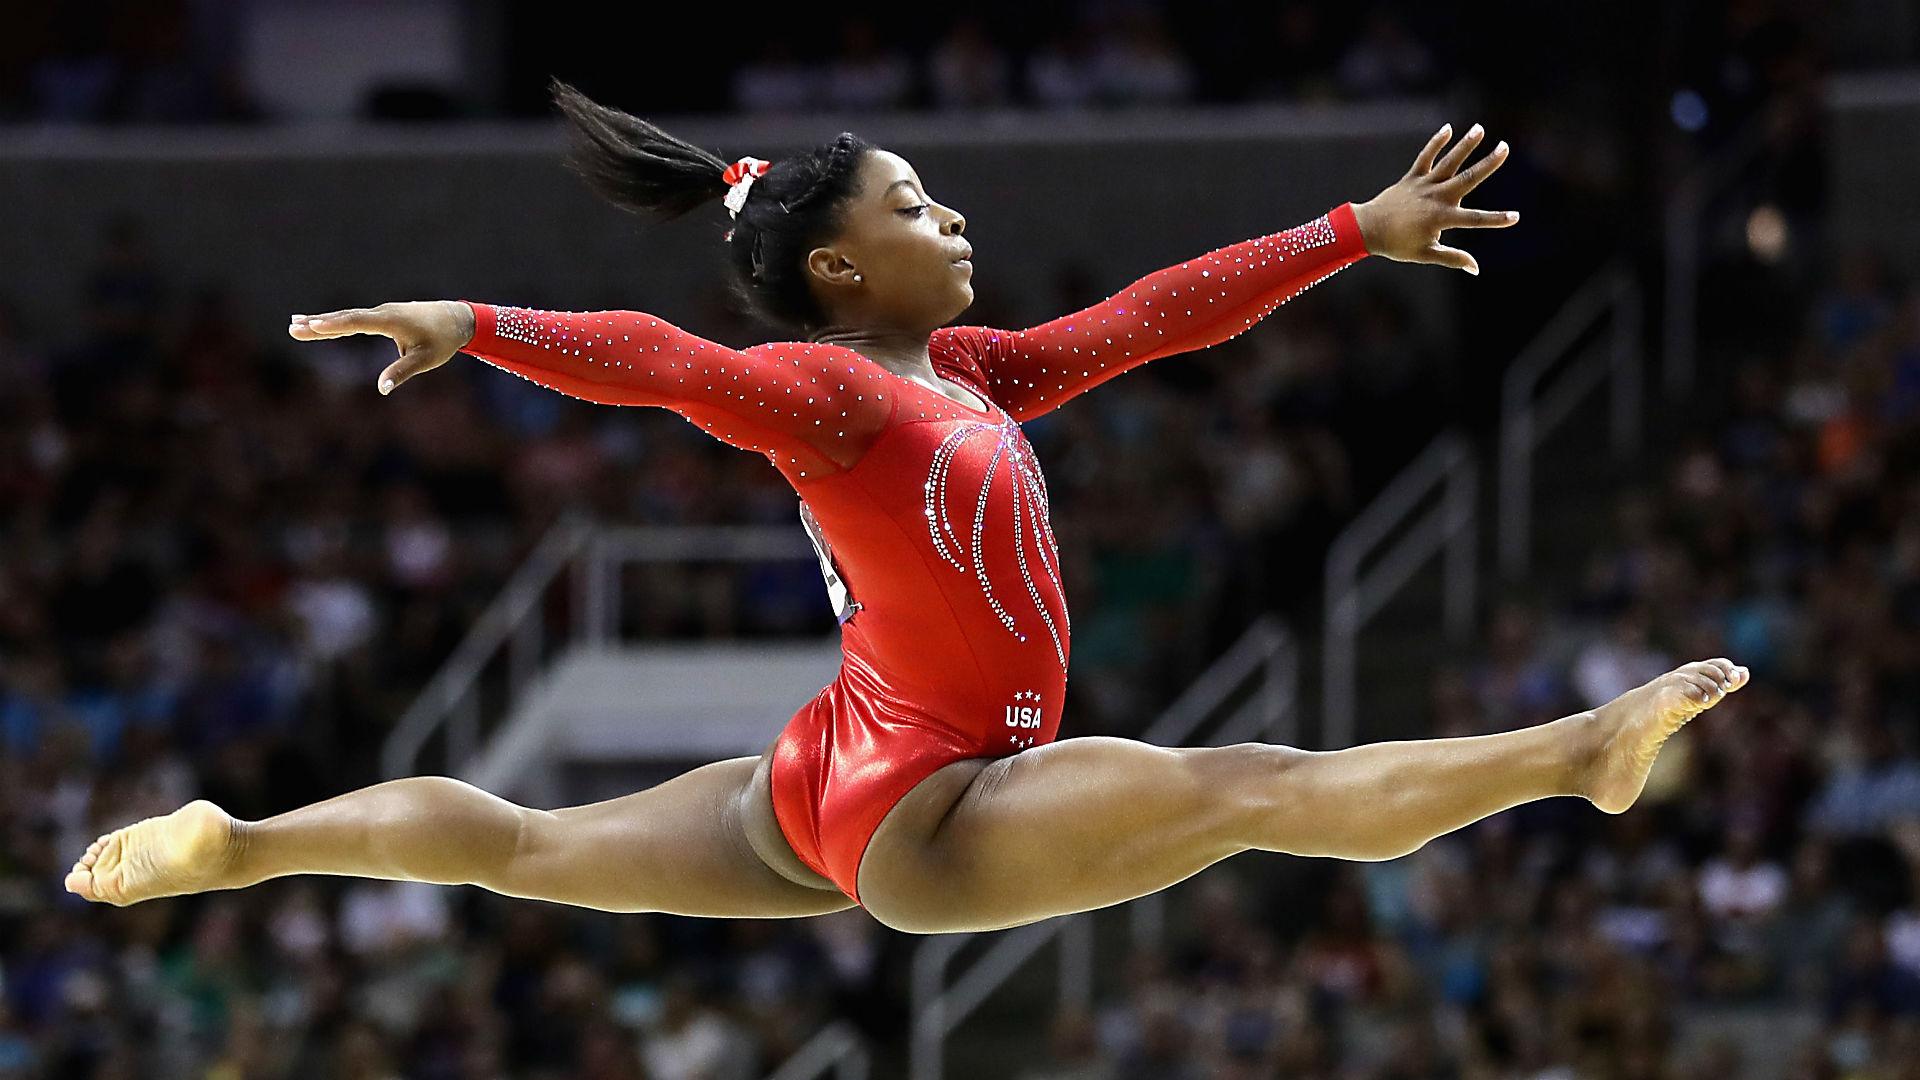 Simone Biles could be greatest women's gymnast ever, NBC's Bob Costas ...